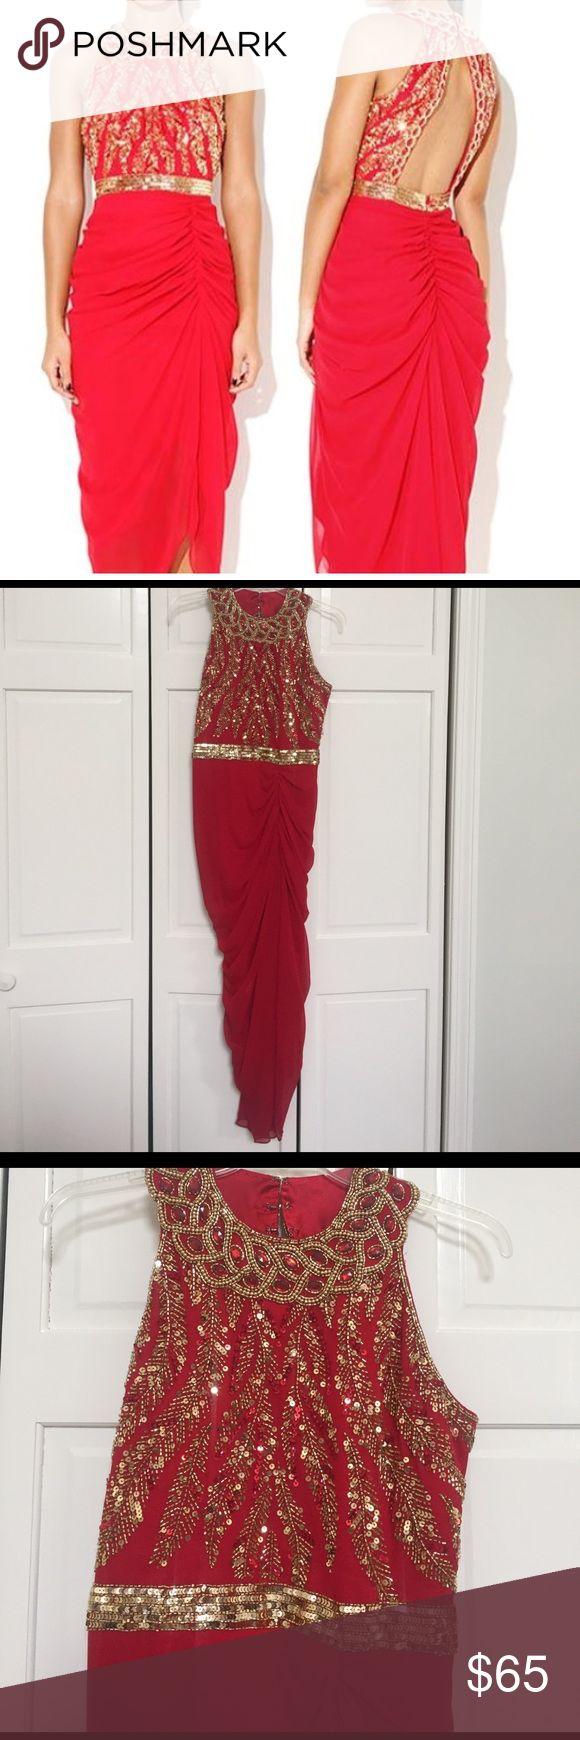 Glamorous Virgos Lounge Dress Worn once. Guaranteed head turner in this beautiful red gem 😍 Virgos Lounge Dresses Midi